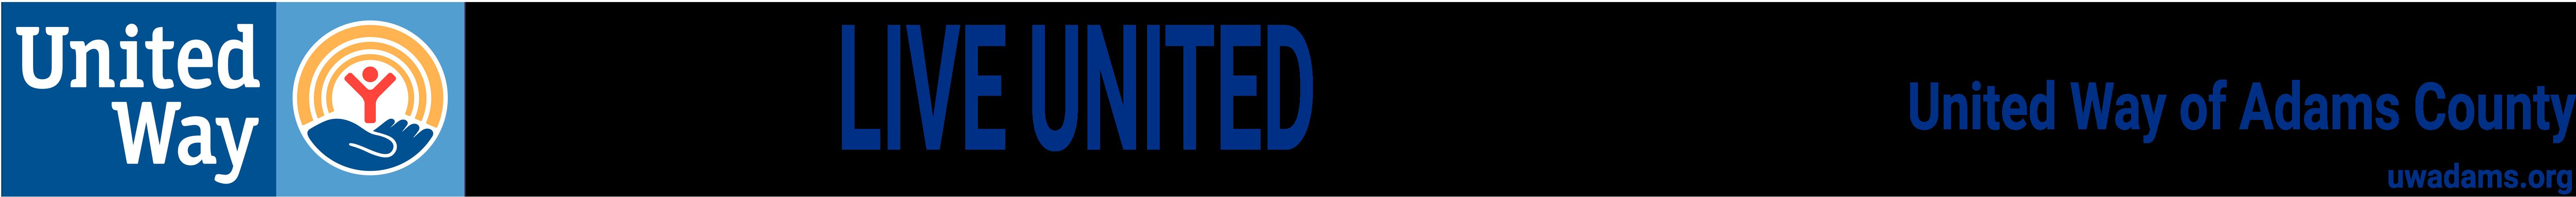 United Way of Adams County Logo